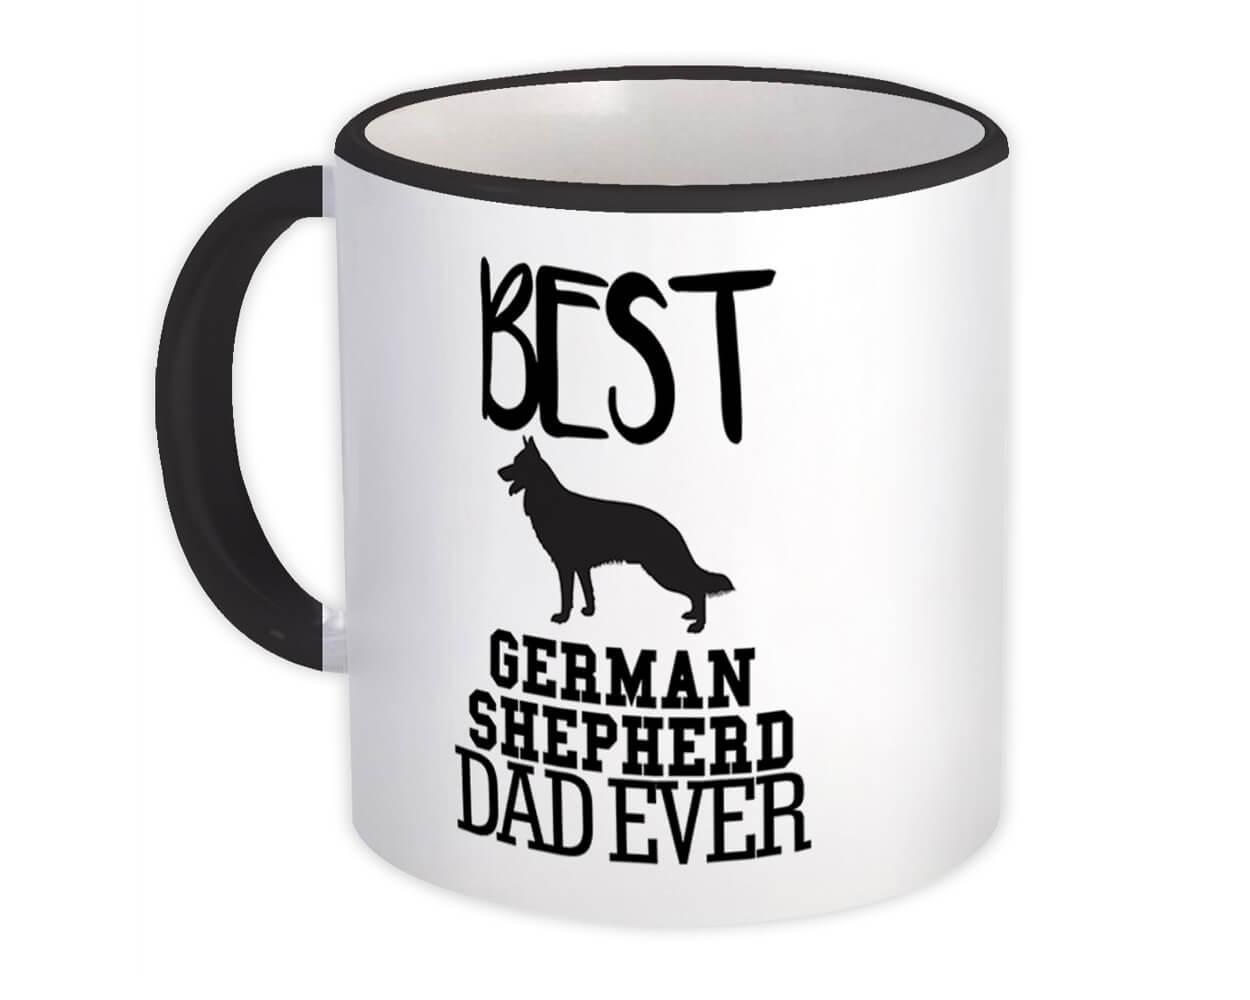 Best German Shepherd Dad Ever : Gift Mug Dog Silhouette Funny Pet Cartoon Owner